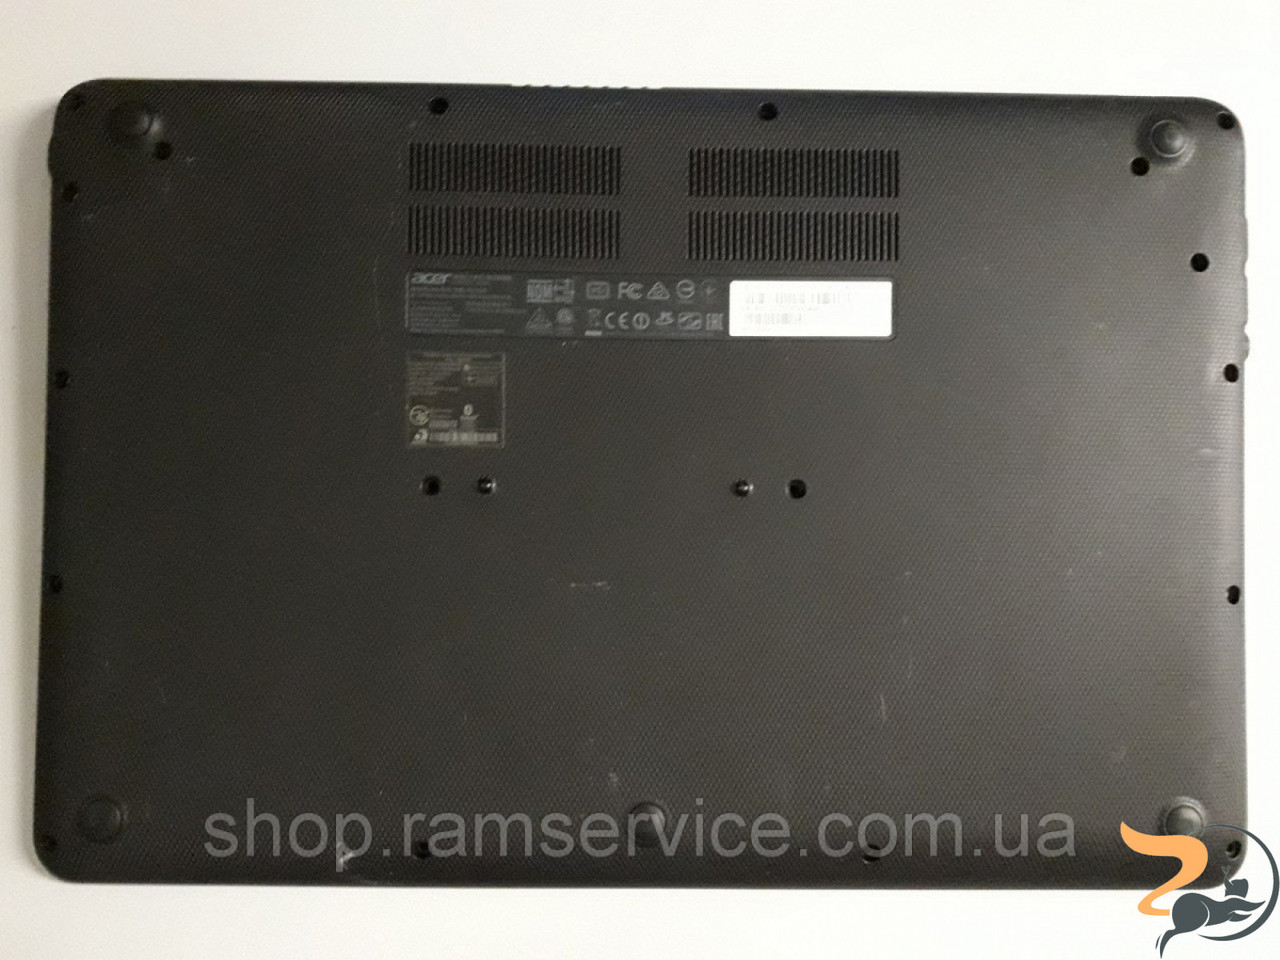 Нижня частина корпусу для ноутбука Acer CB3-531, б/в